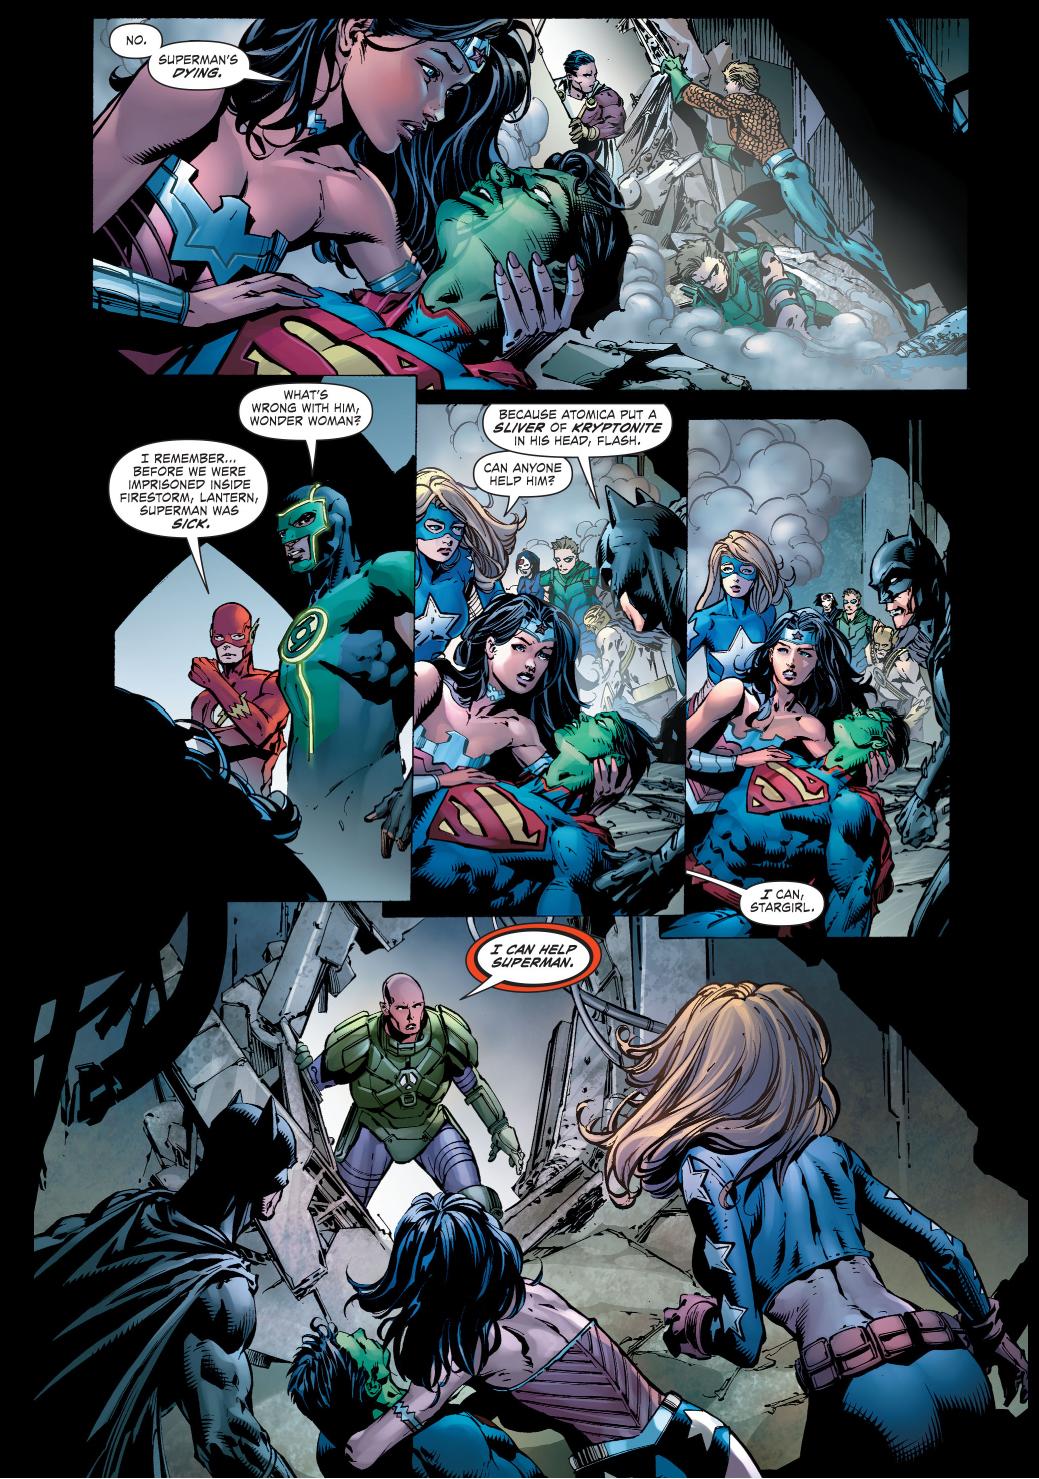 lex luthor operates on superman